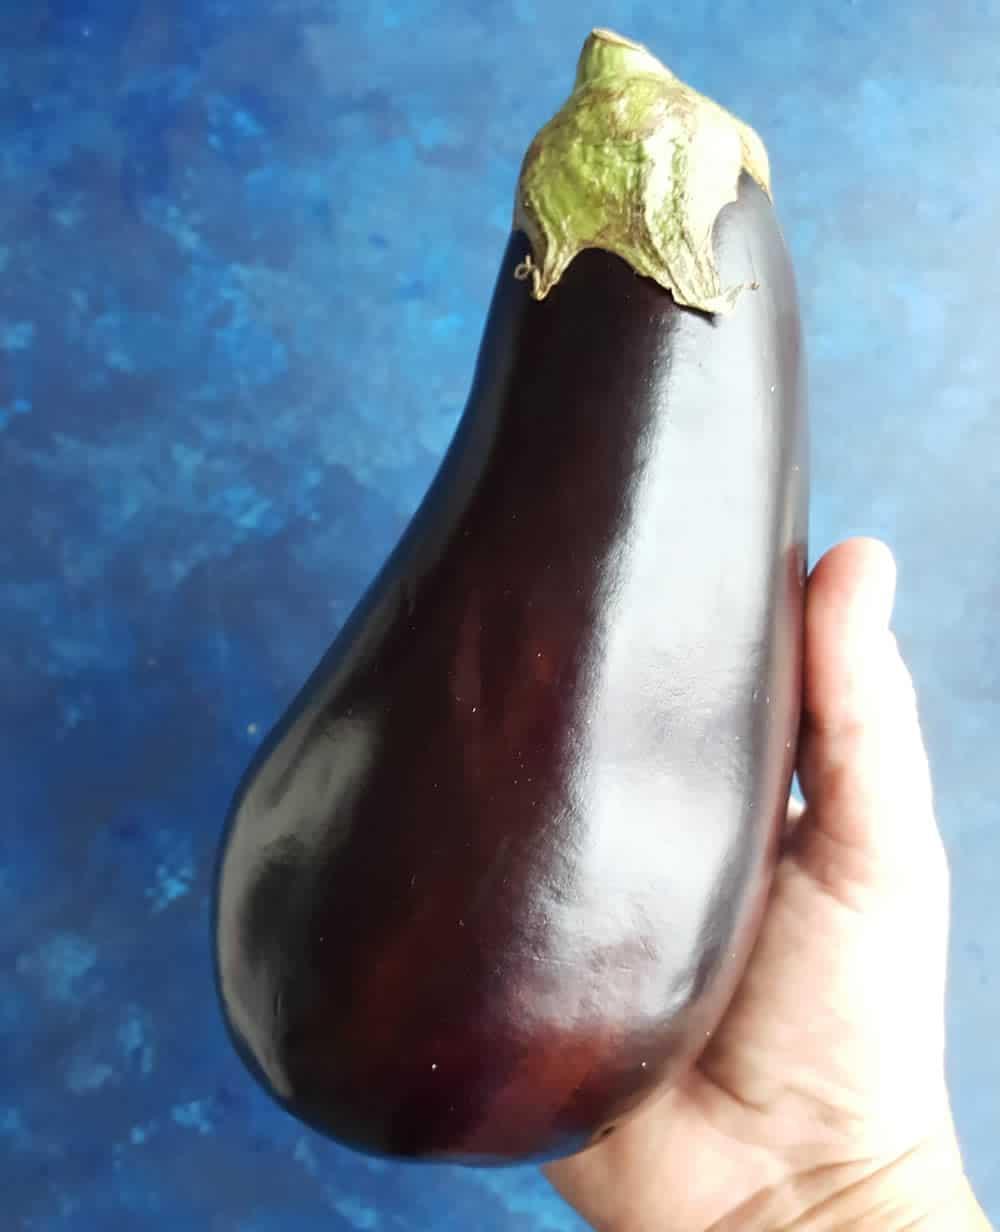 Holding an eggplant